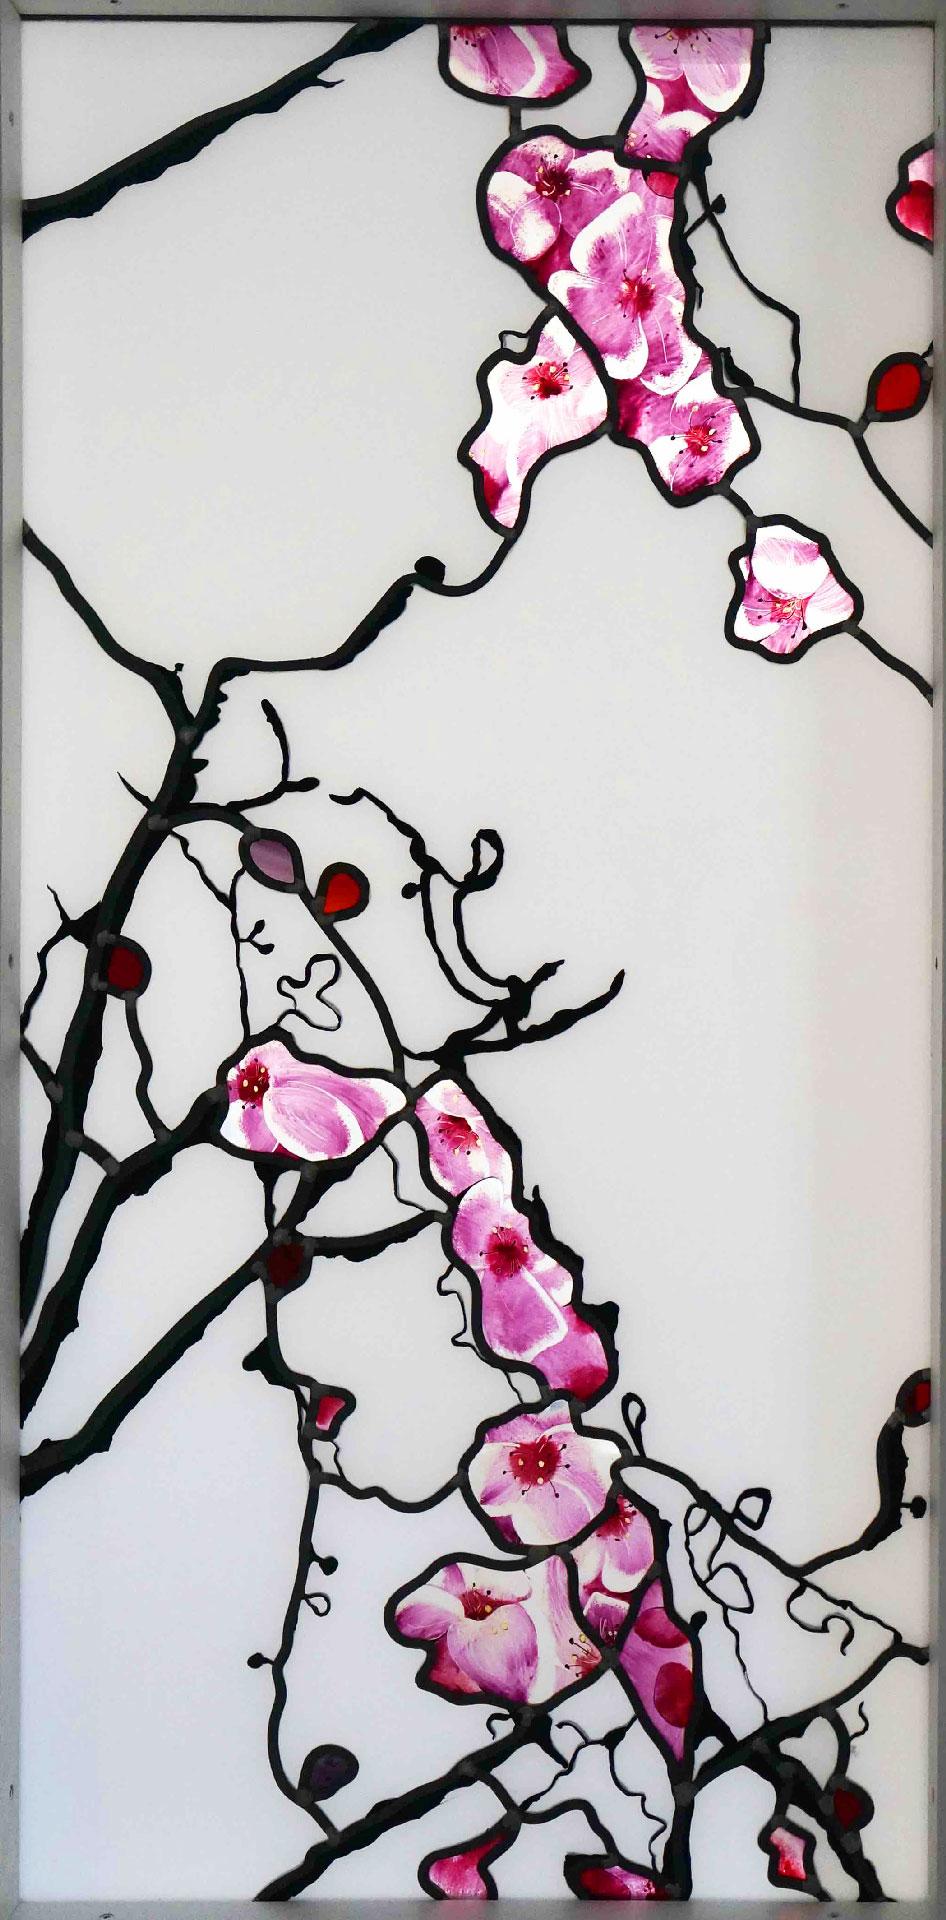 vitrail-cerisier